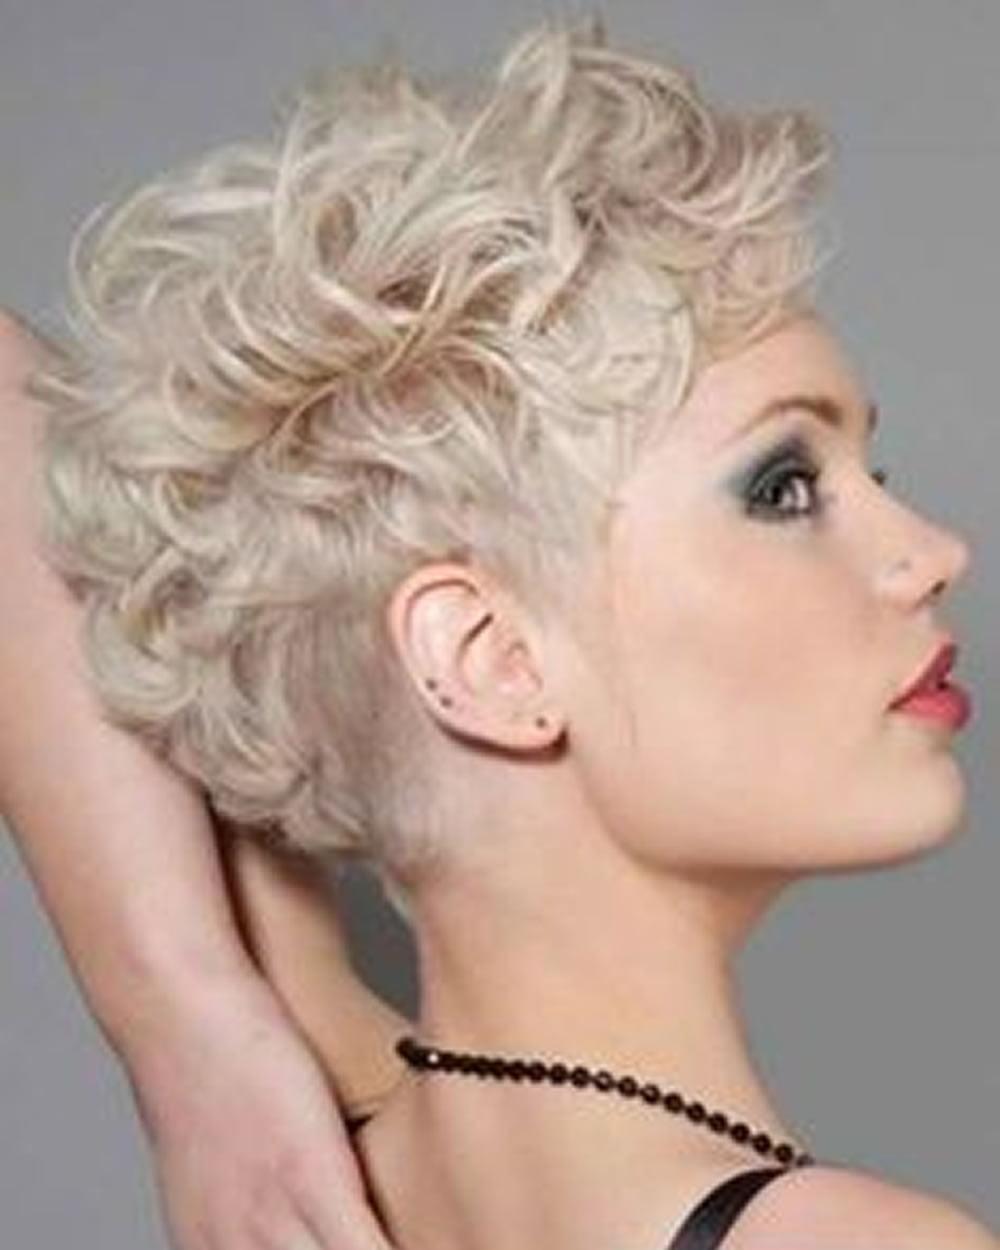 2018 Undercut hair design for girls - Pixie hairstyle +Short haircut image